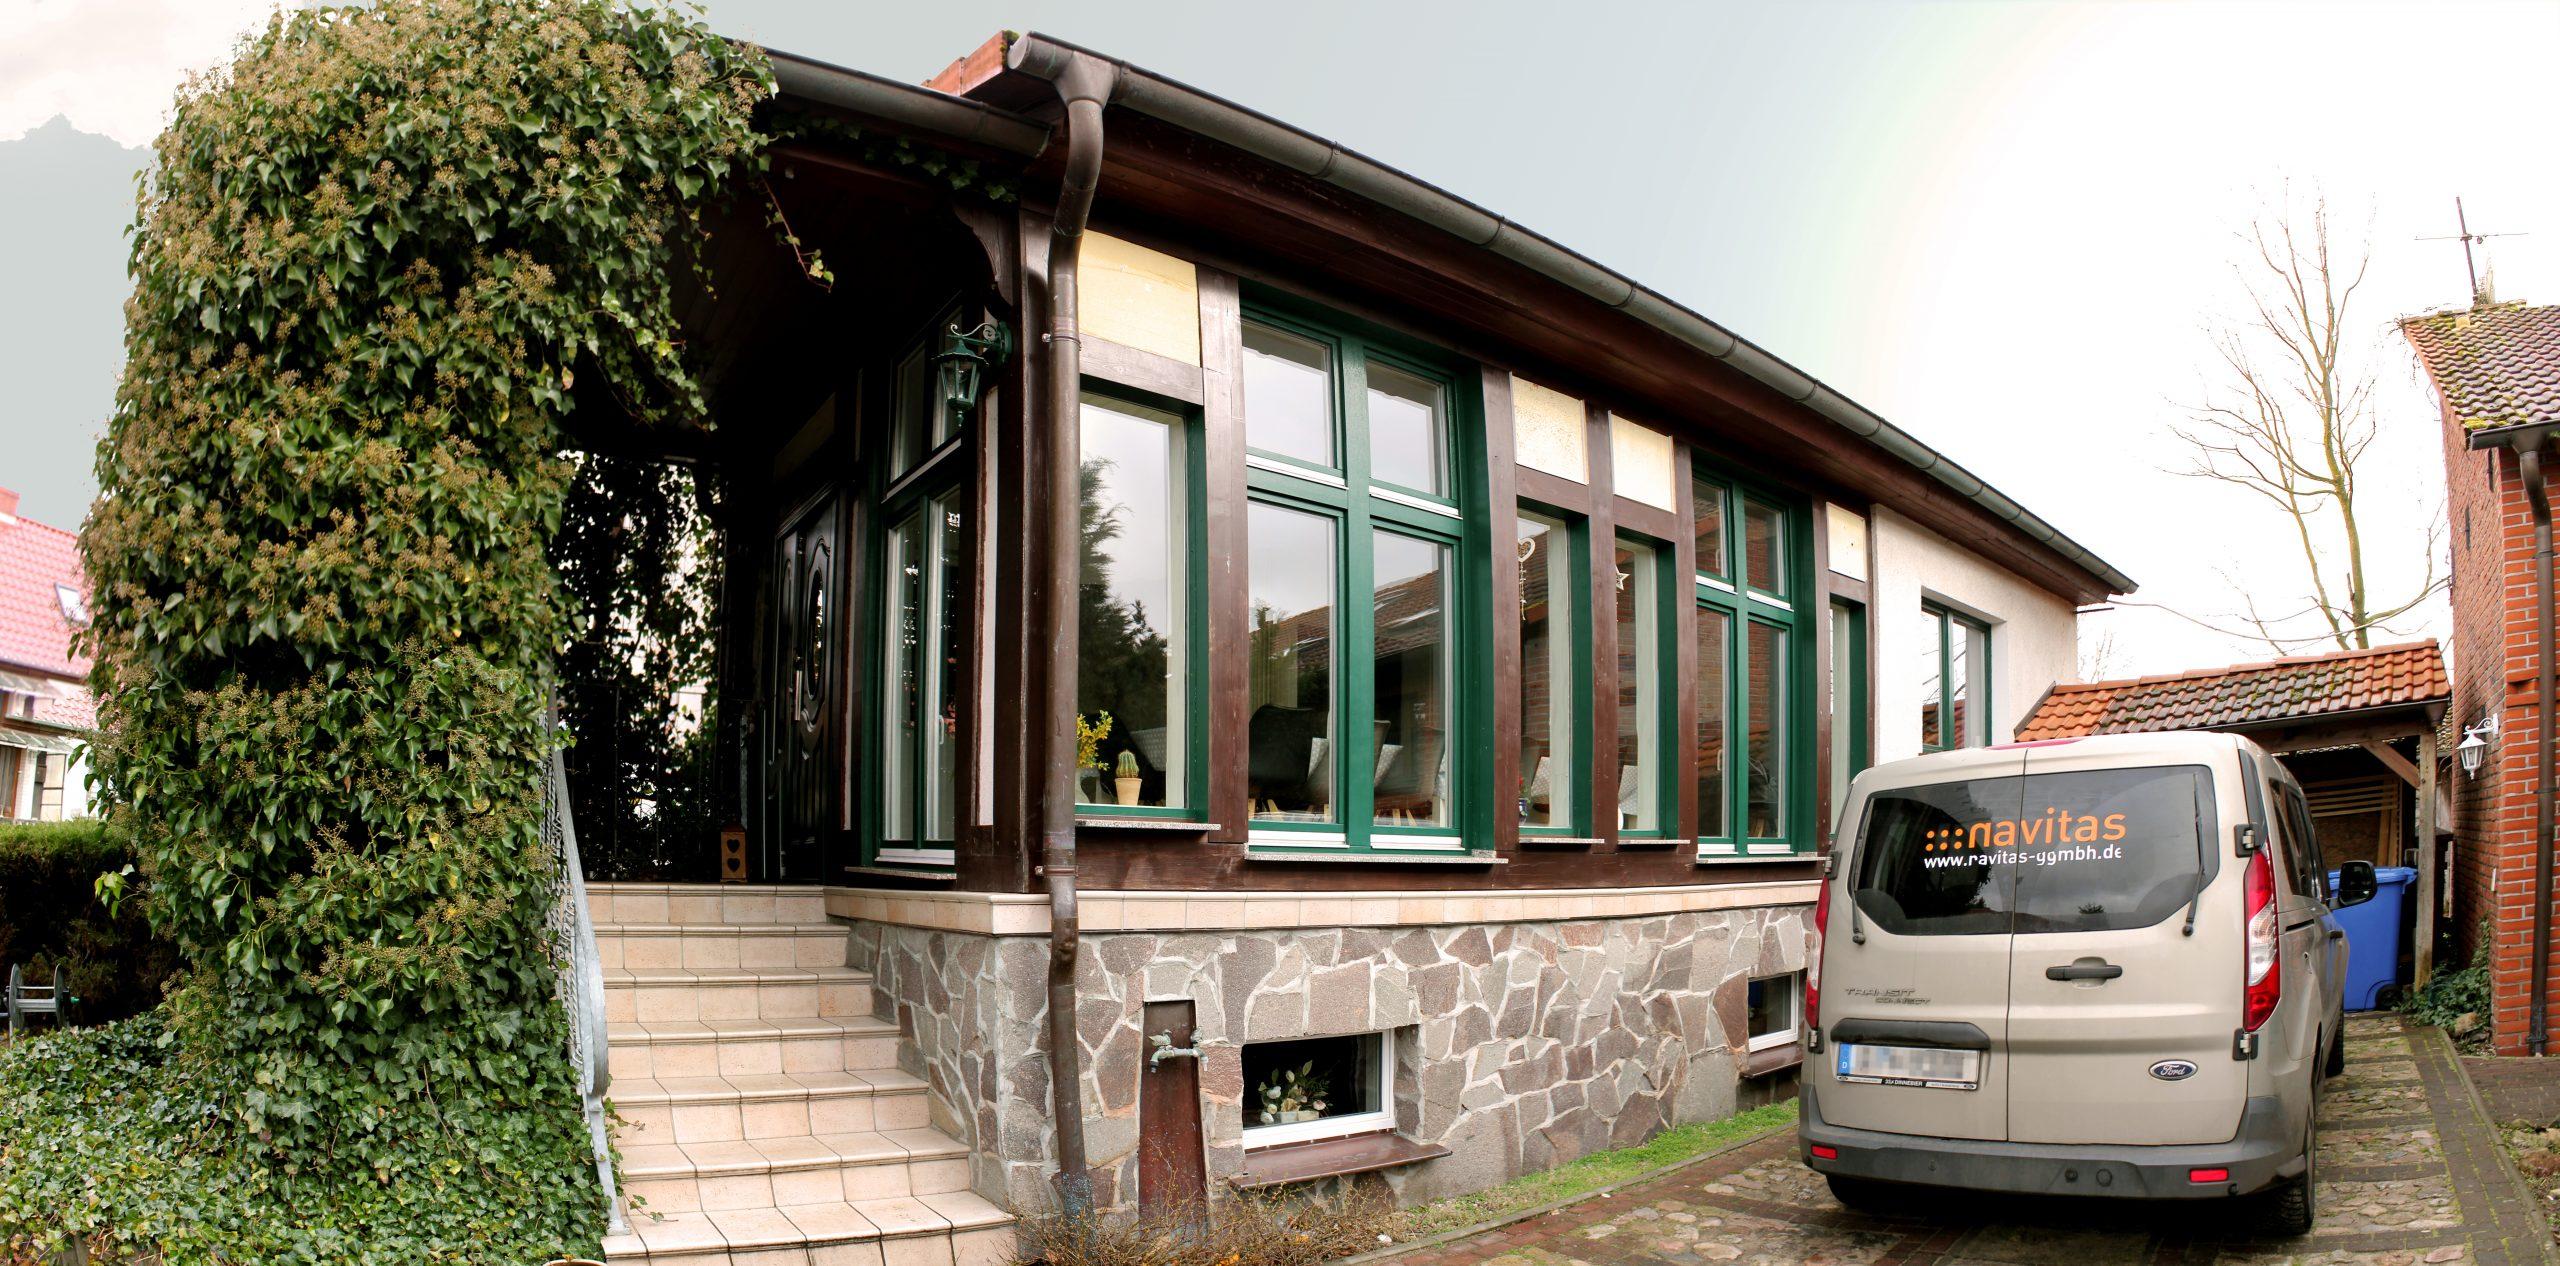 Haus Lilienhof, stationäre Jugendhilfe der navitas gGmbH